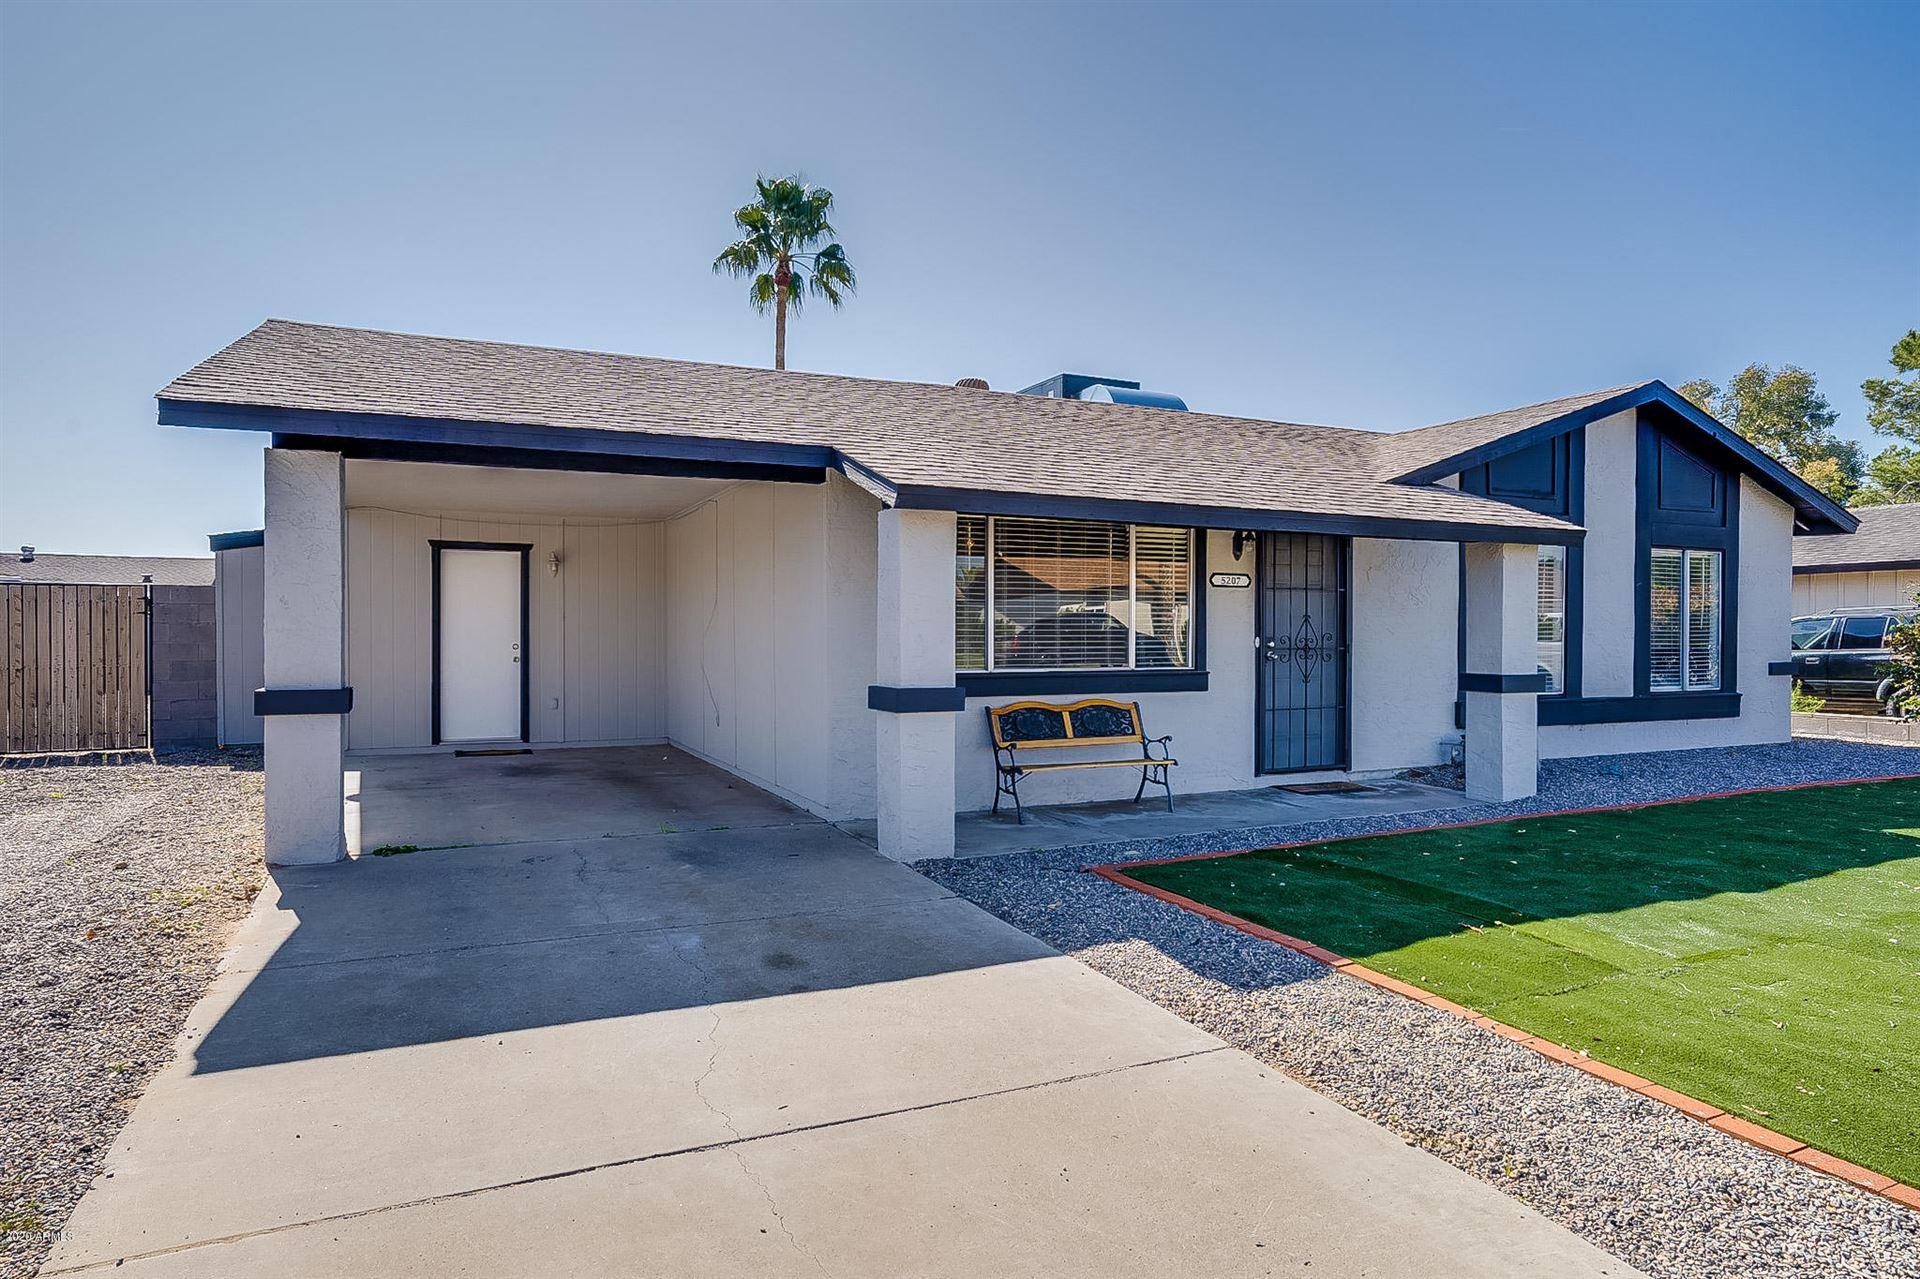 Photo of 5207 W SUNNYSIDE Drive, Glendale, AZ 85304 (MLS # 6233696)